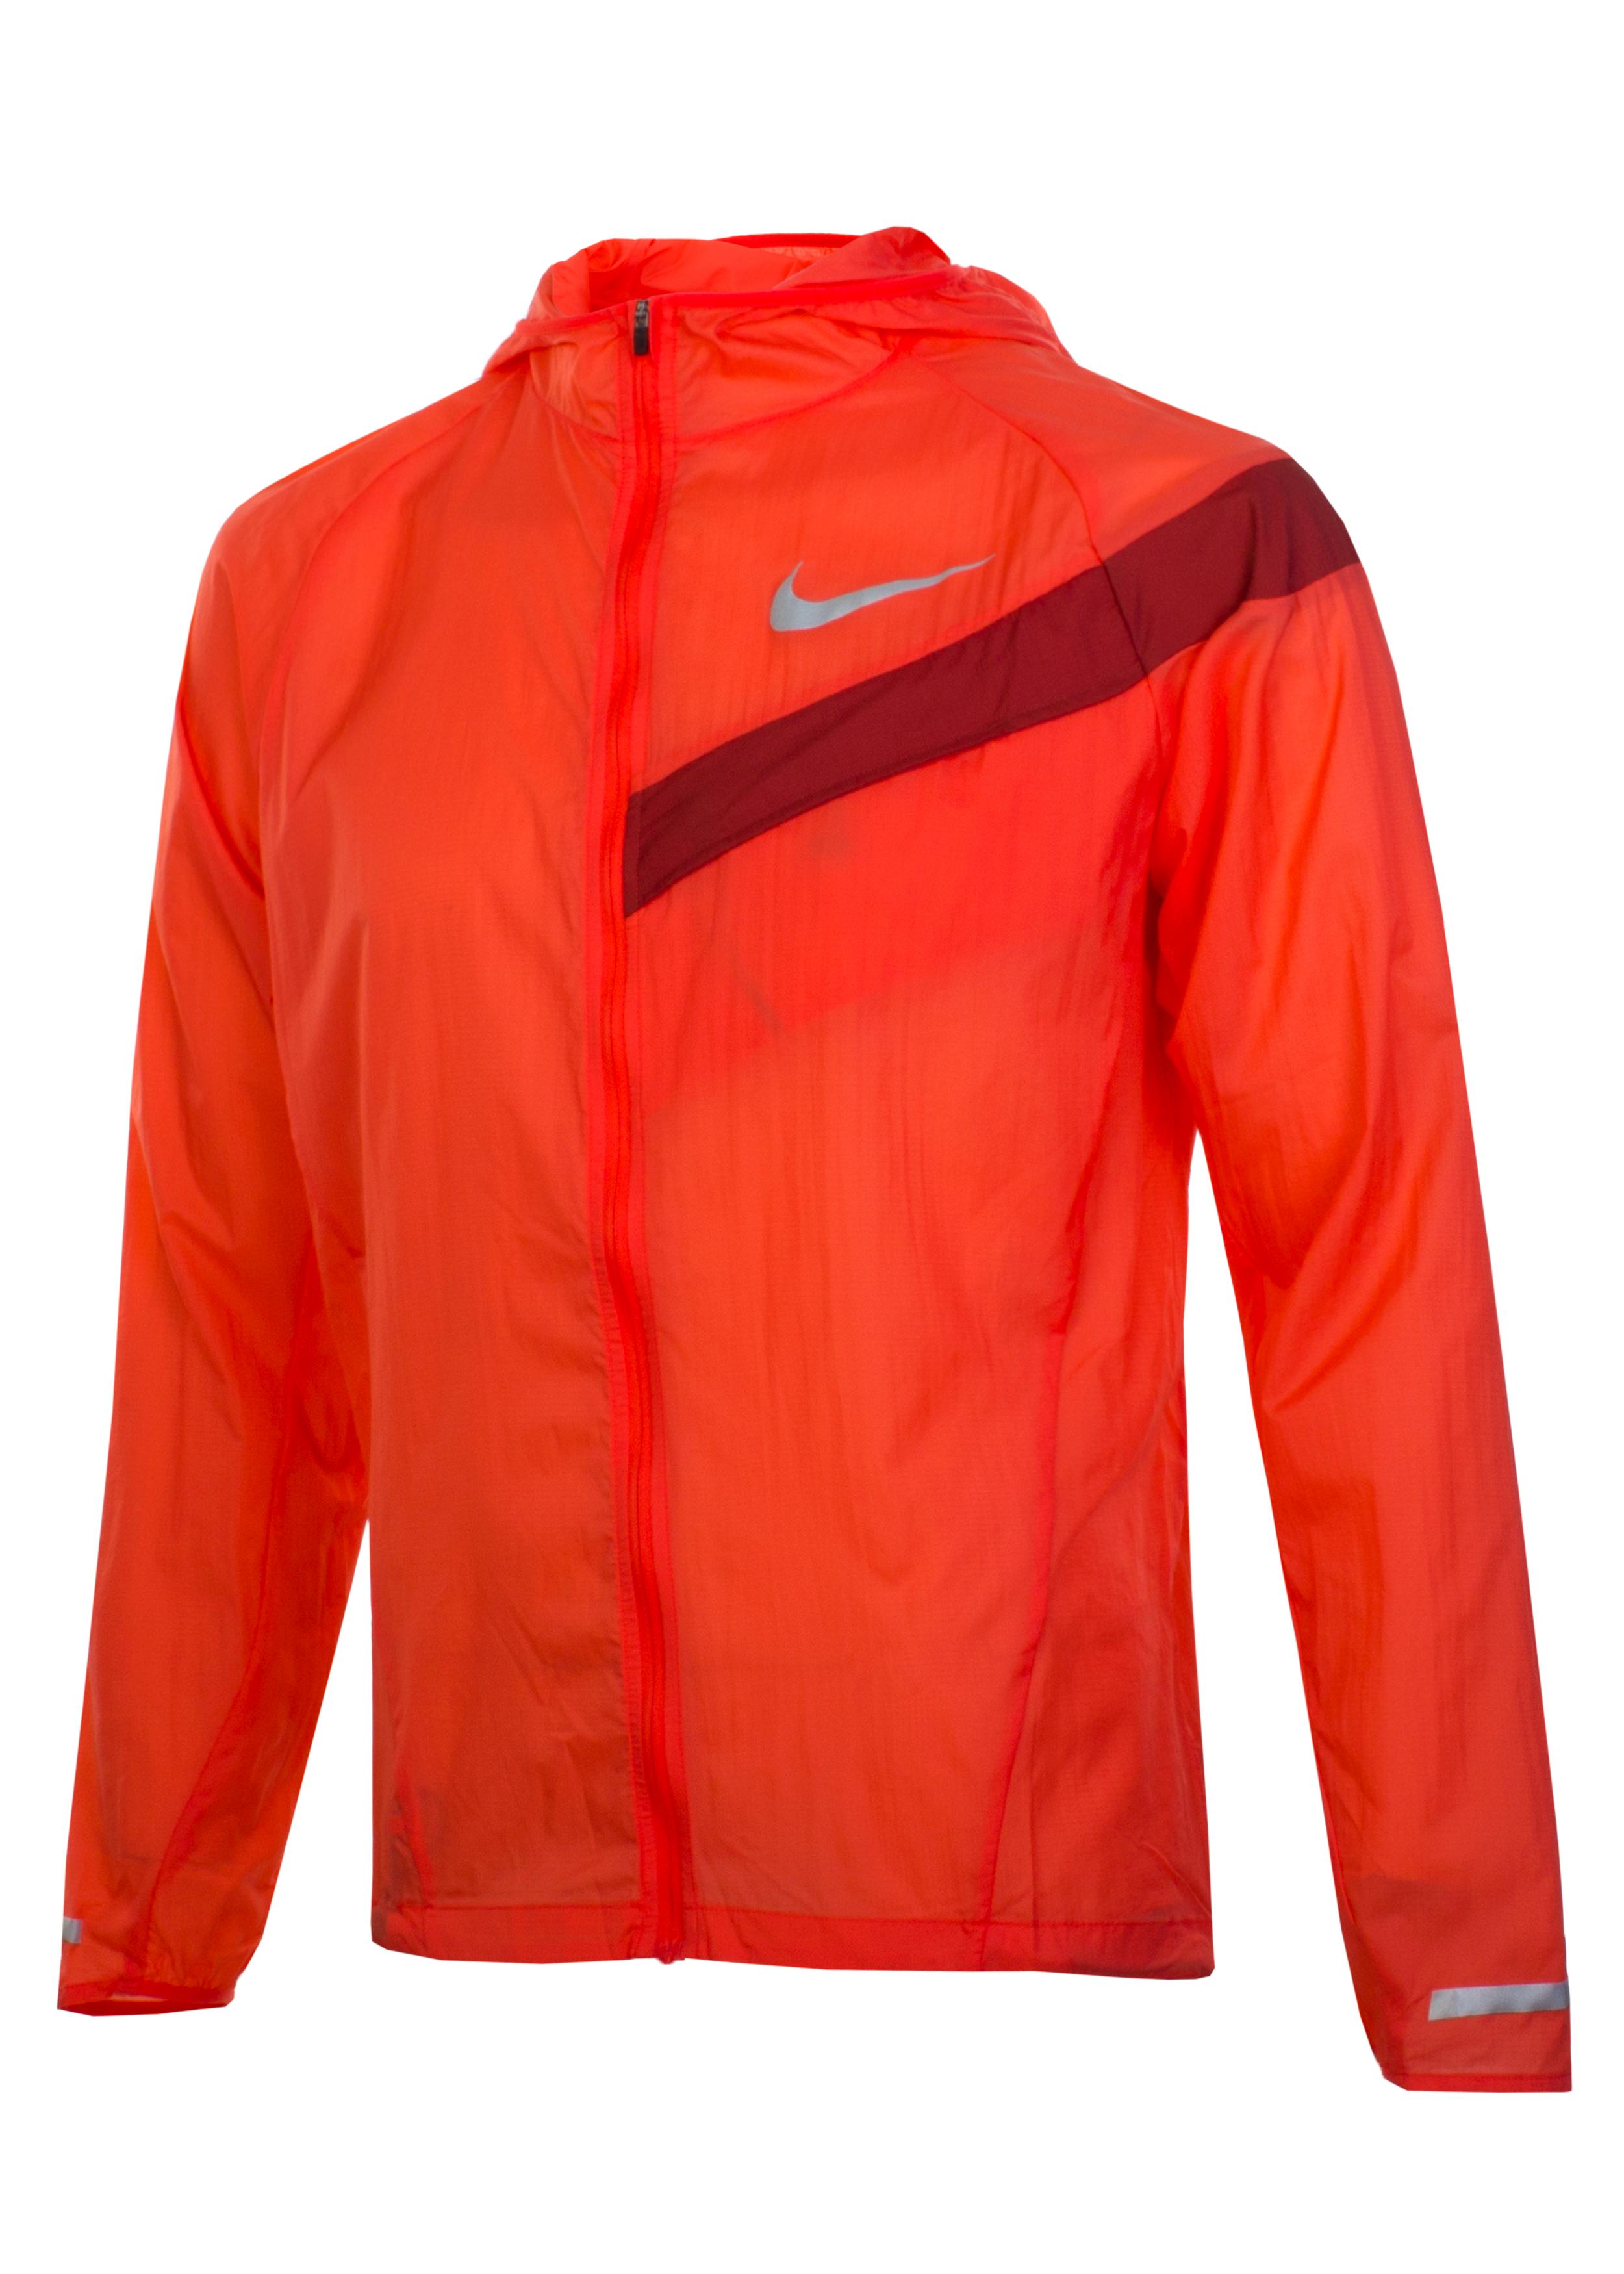 c84ac5ea Ветровка мужская Nike Impossibly Light Running Jacket - Сеть ...